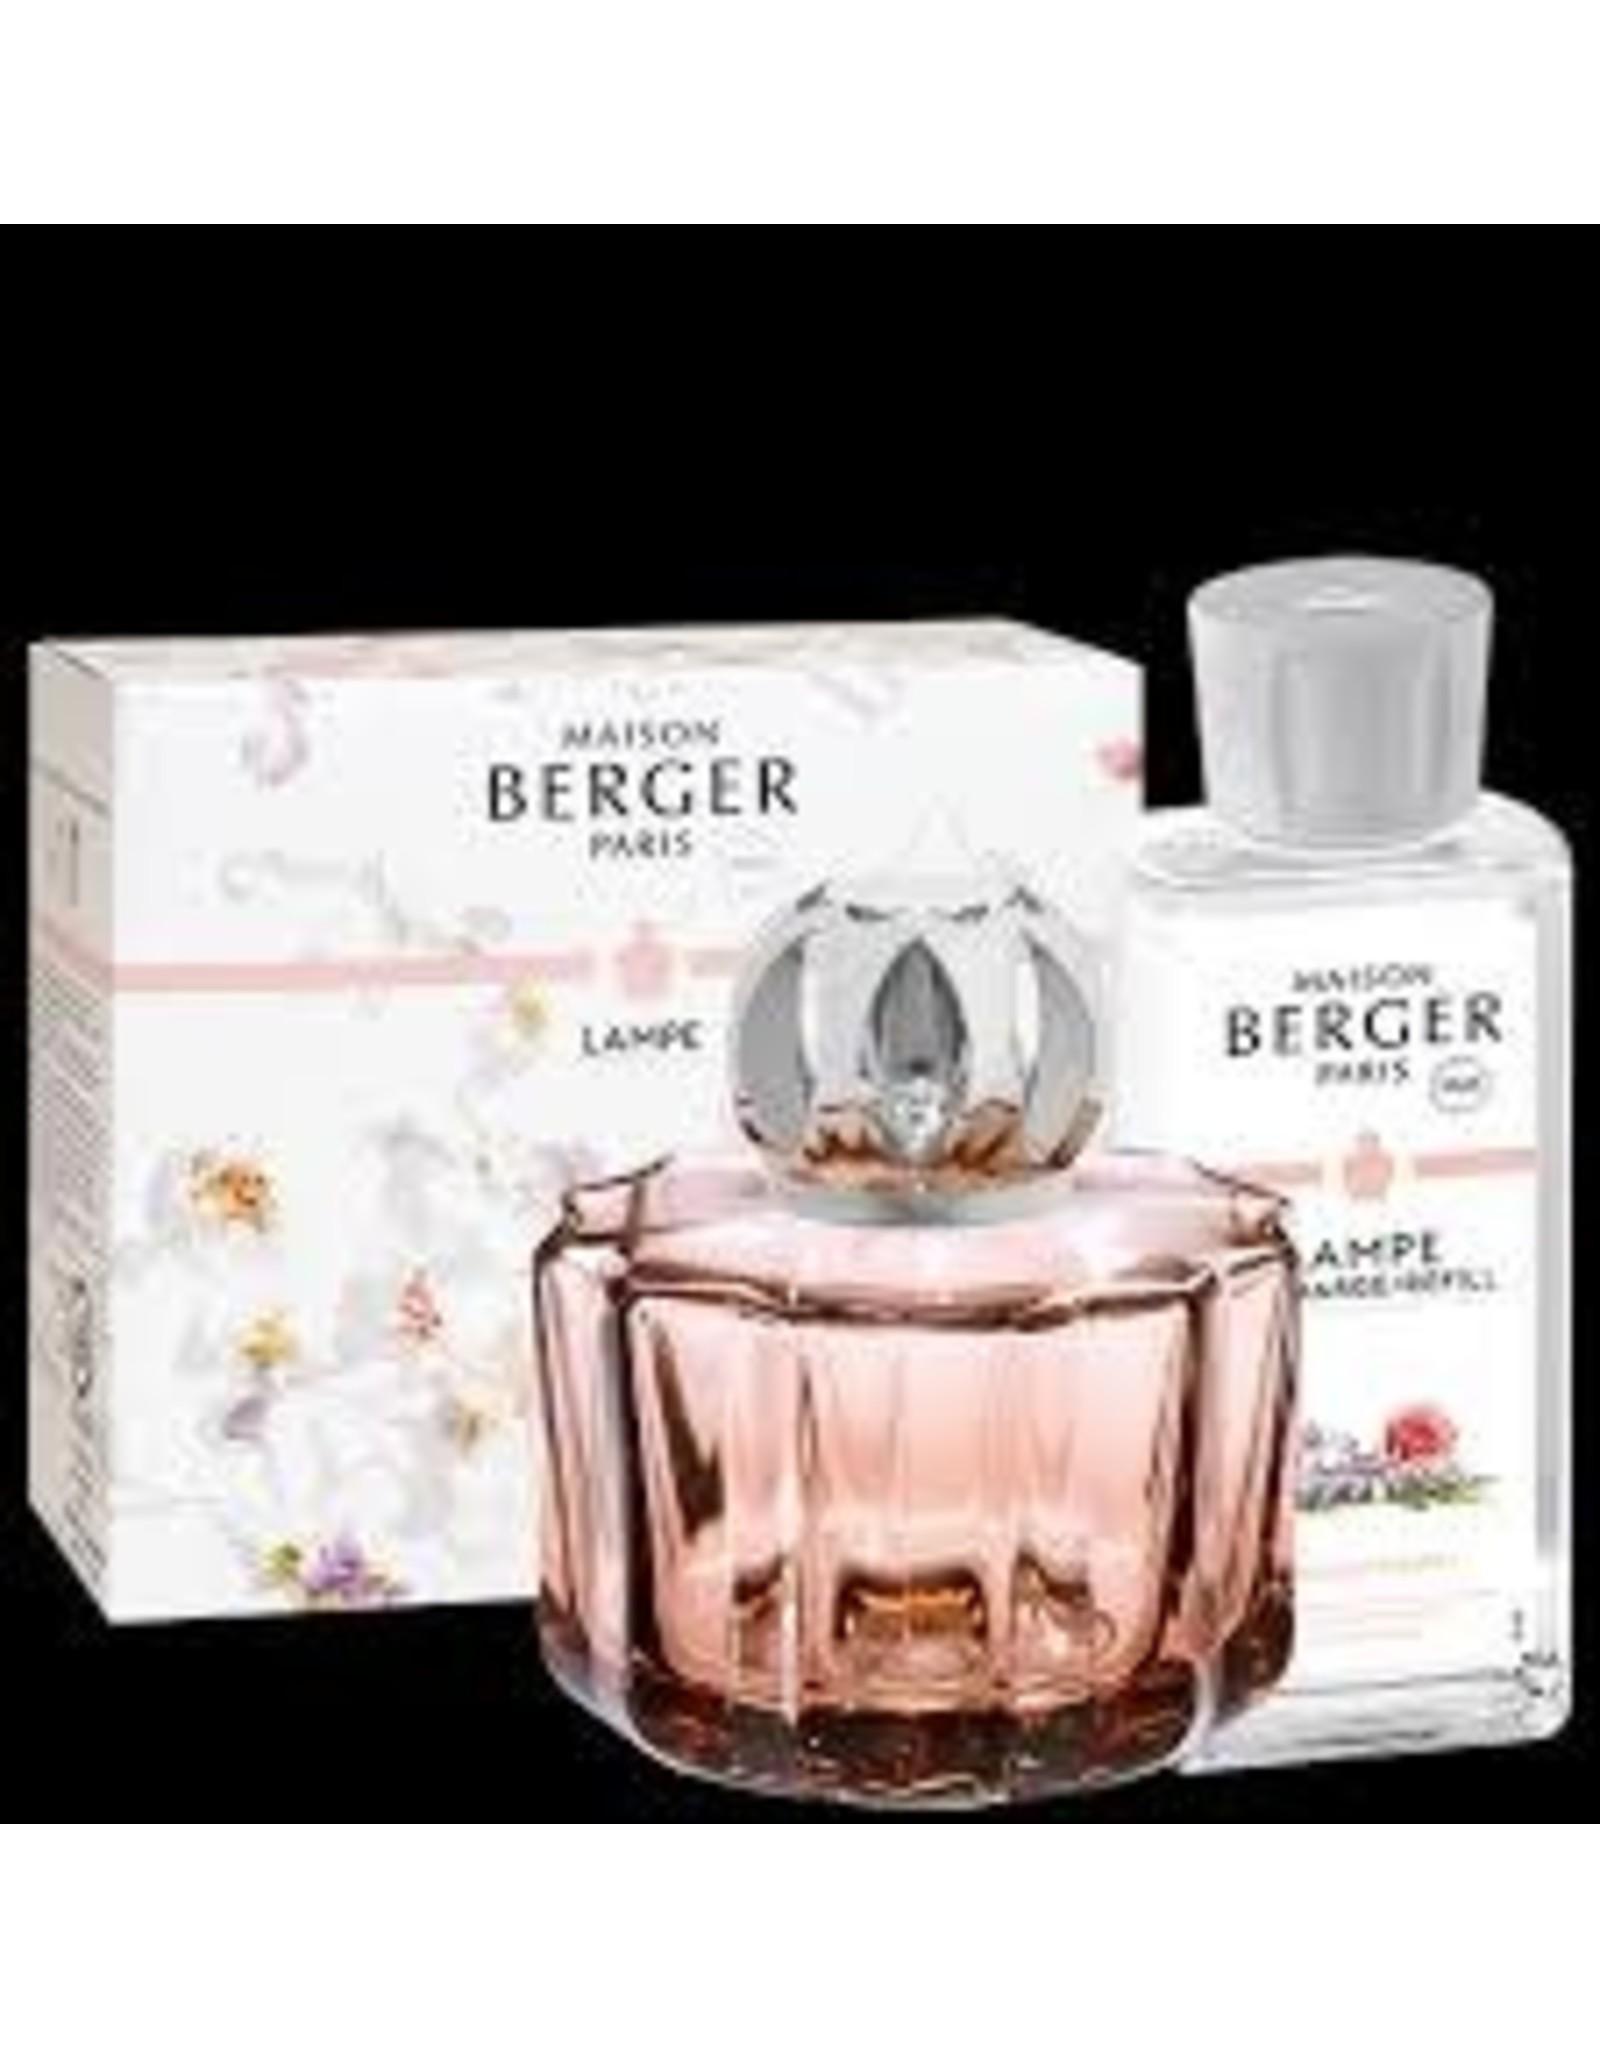 Maison Berger Posey Lampe Berger-Bouquet Liberty Gift Pack